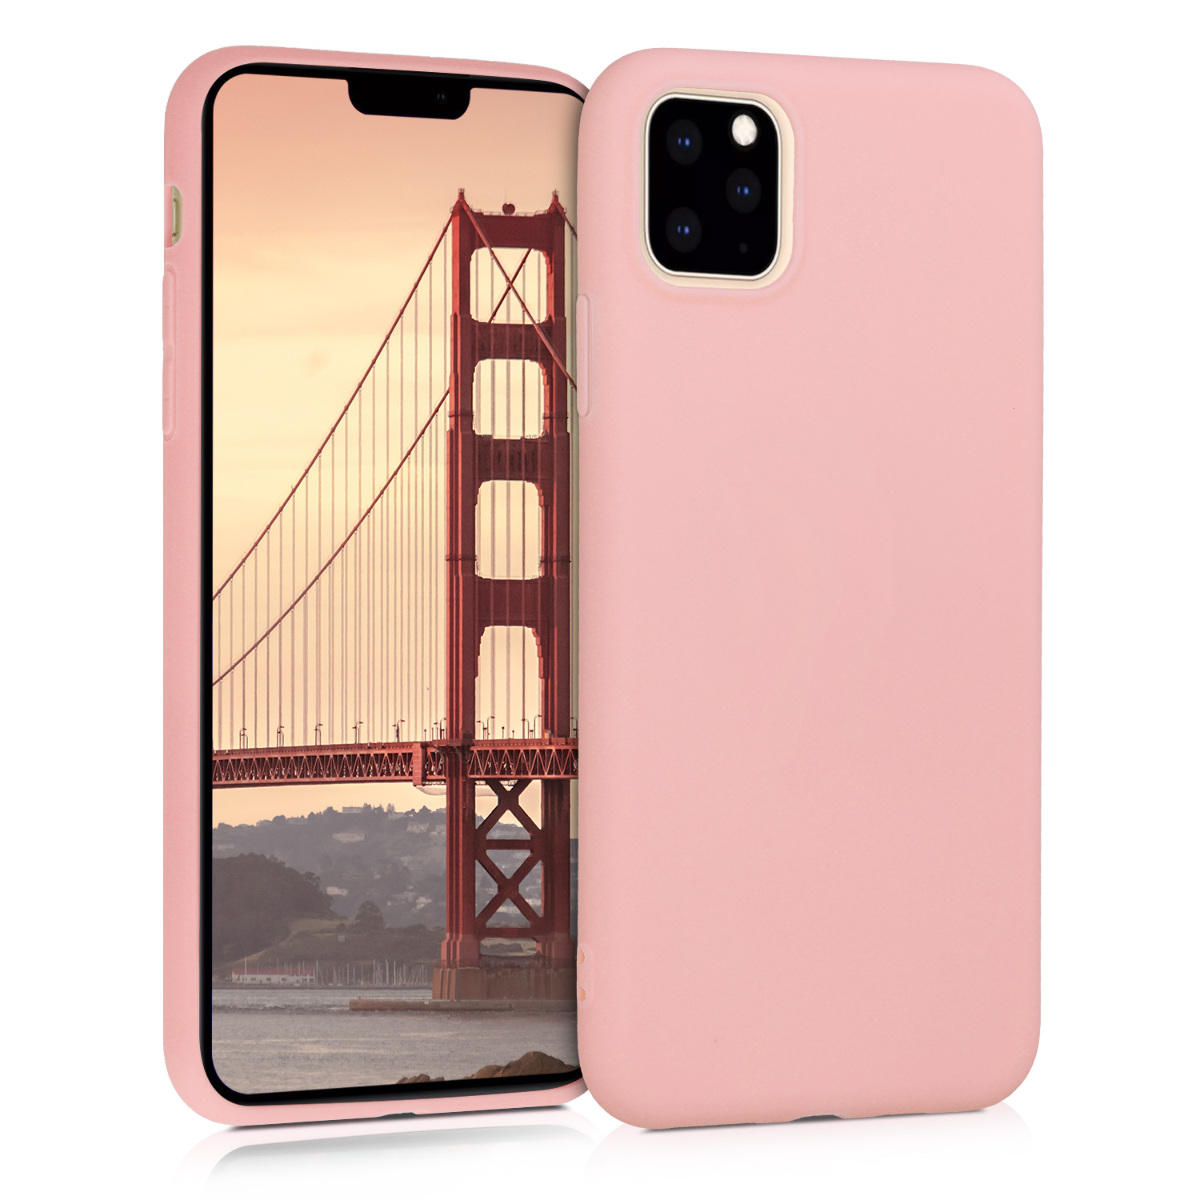 KW Θήκη Σιλικόνης iPhone 11 Pro Max - Rose Gold Matte (49789.89)